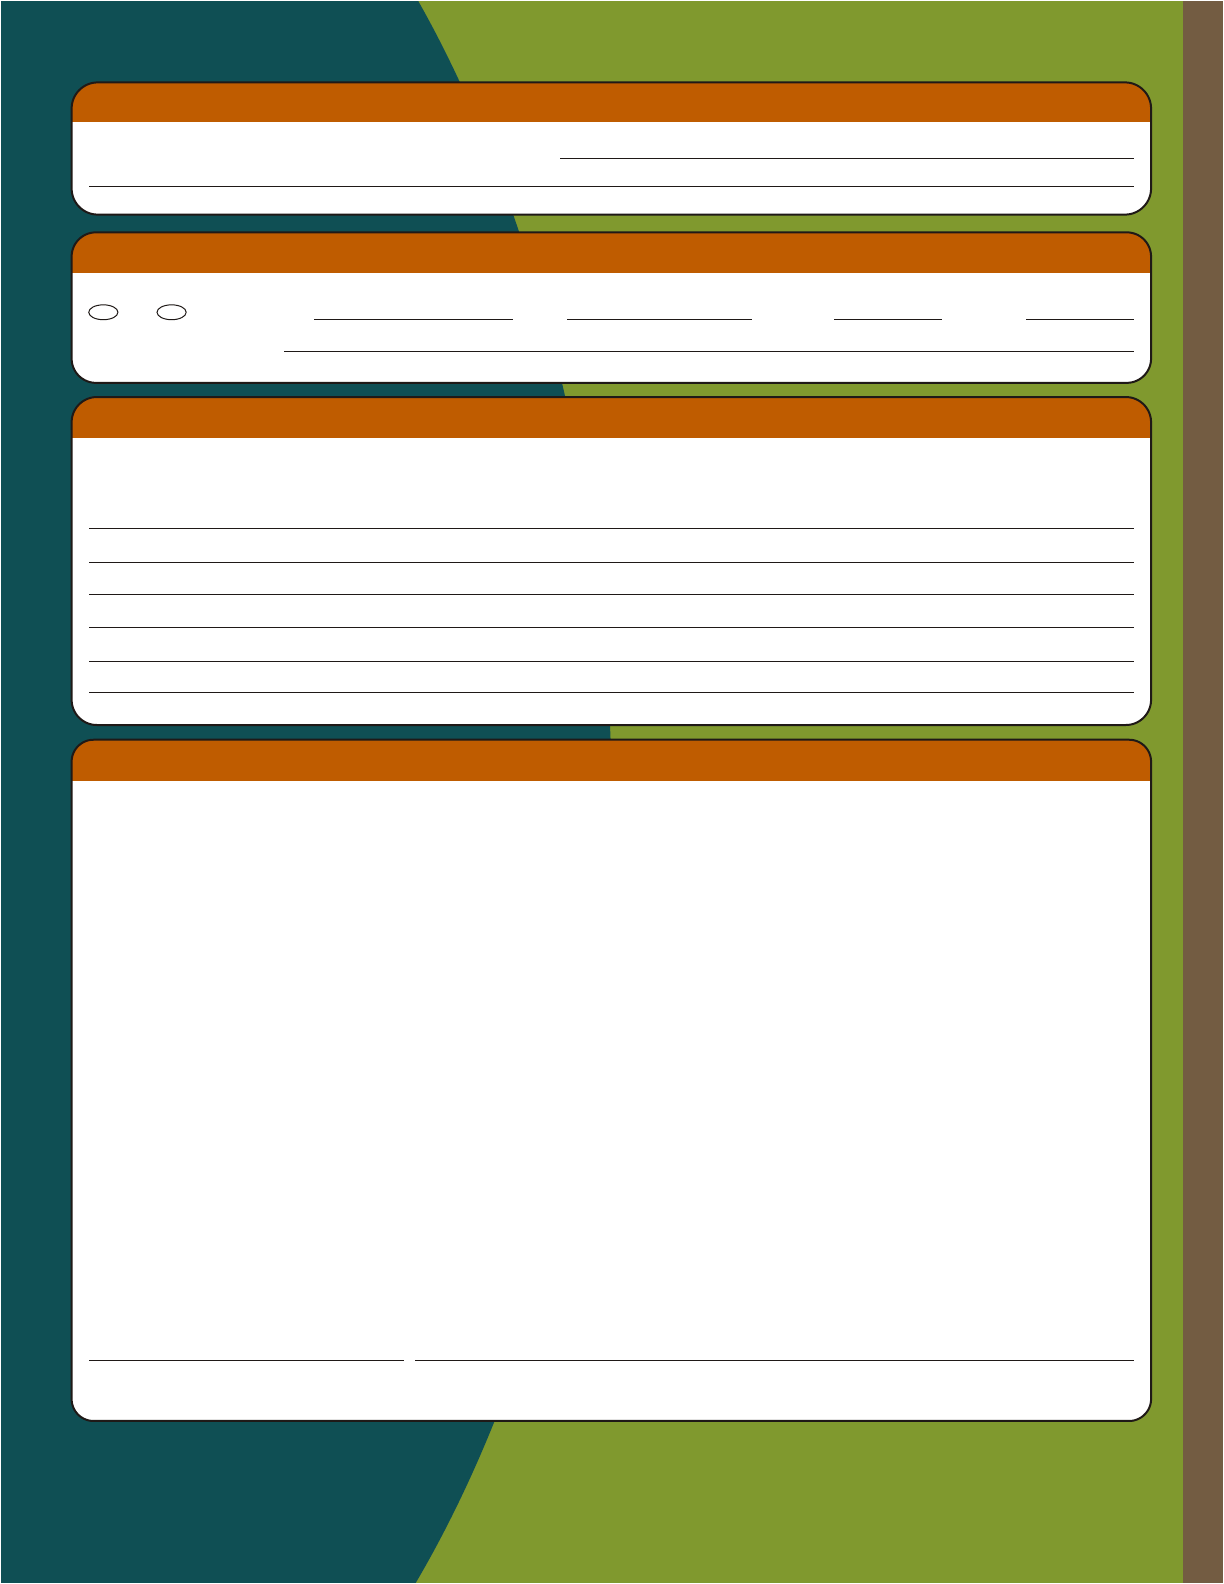 Free printable chick fil a job application form page 2 falaconquin